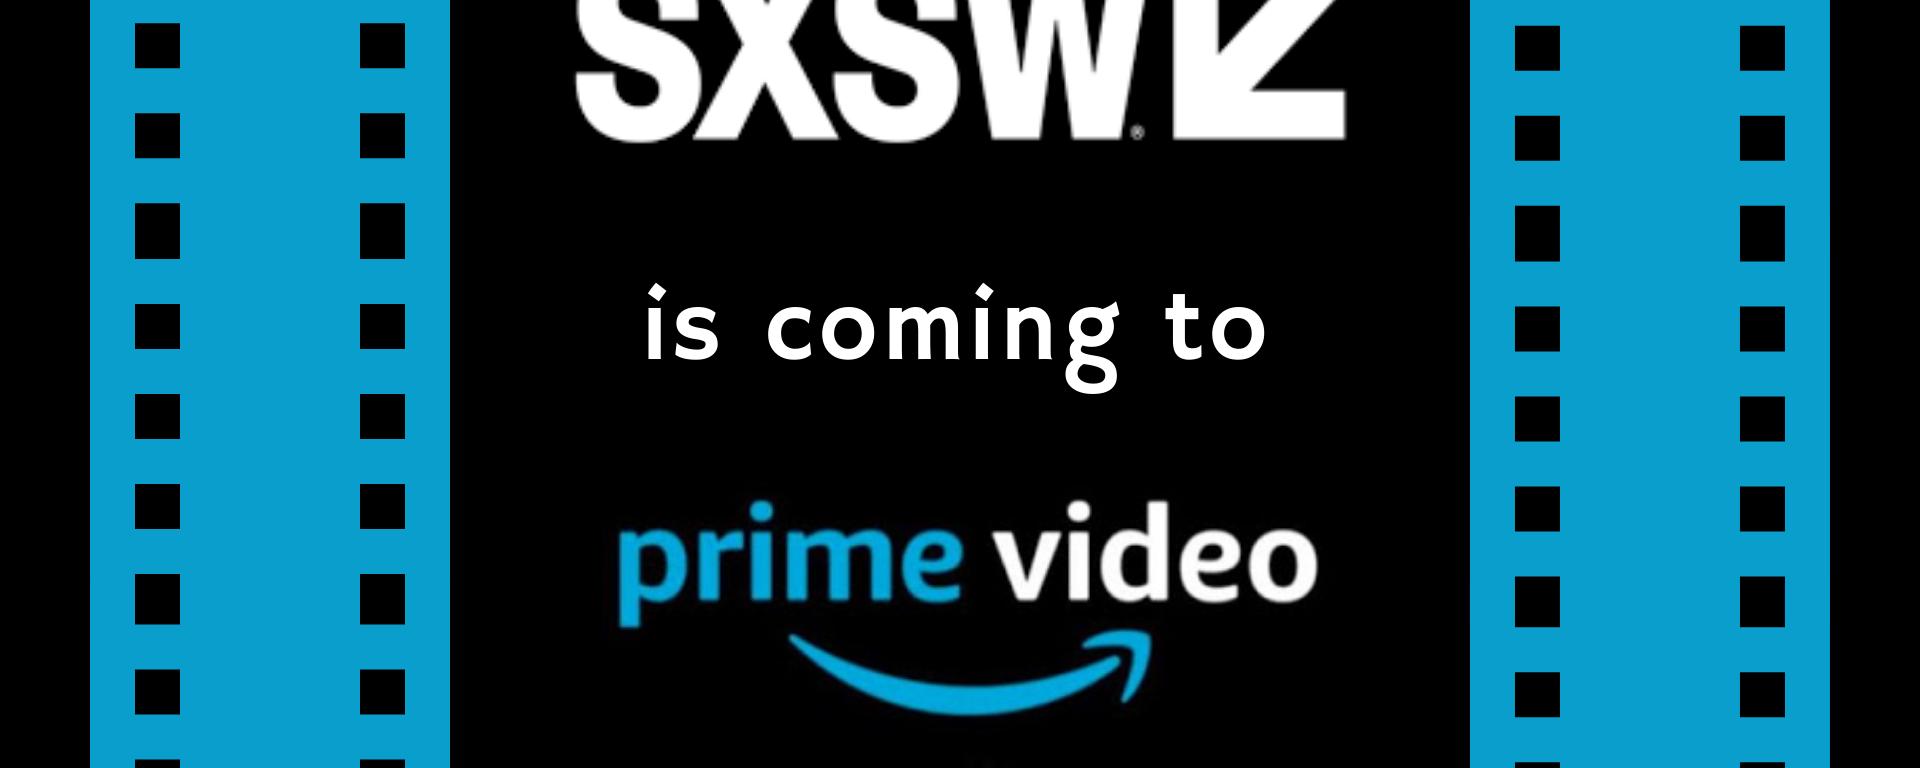 """SXSW is coming to Amazon Prime Video."""